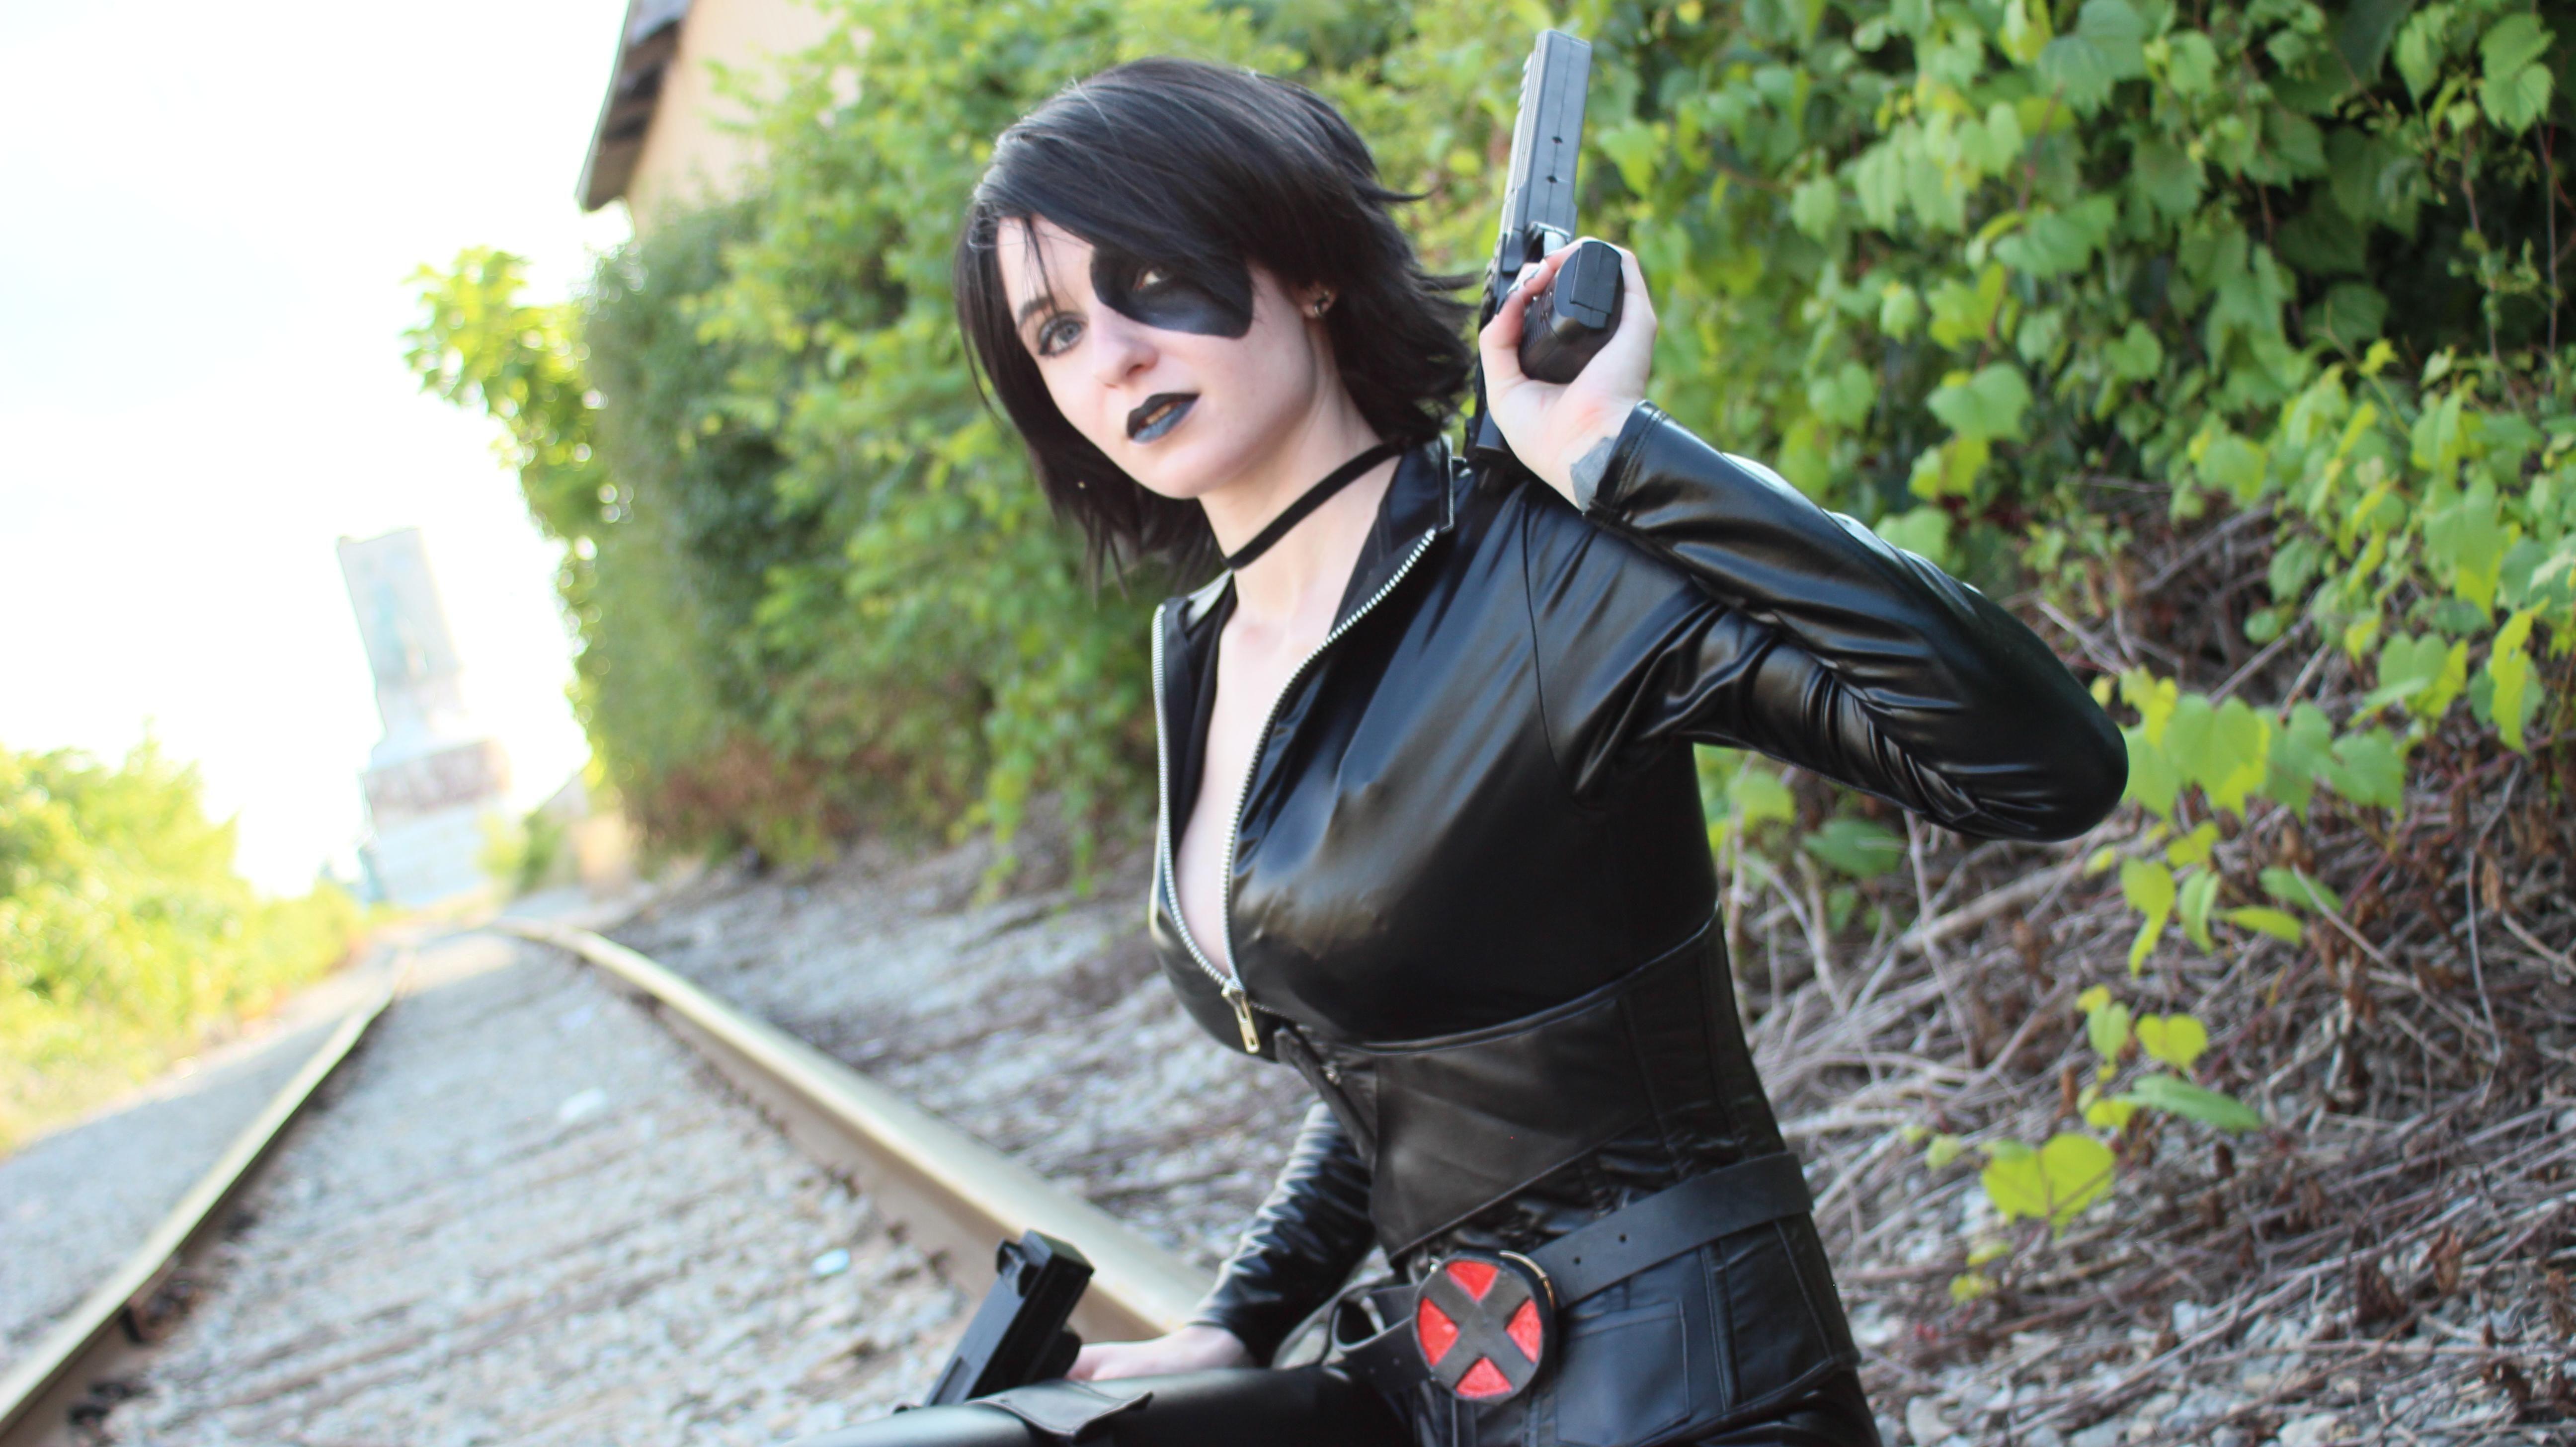 [SELF] Domino cosplay cosplay http//bit.ly/1Pirklu